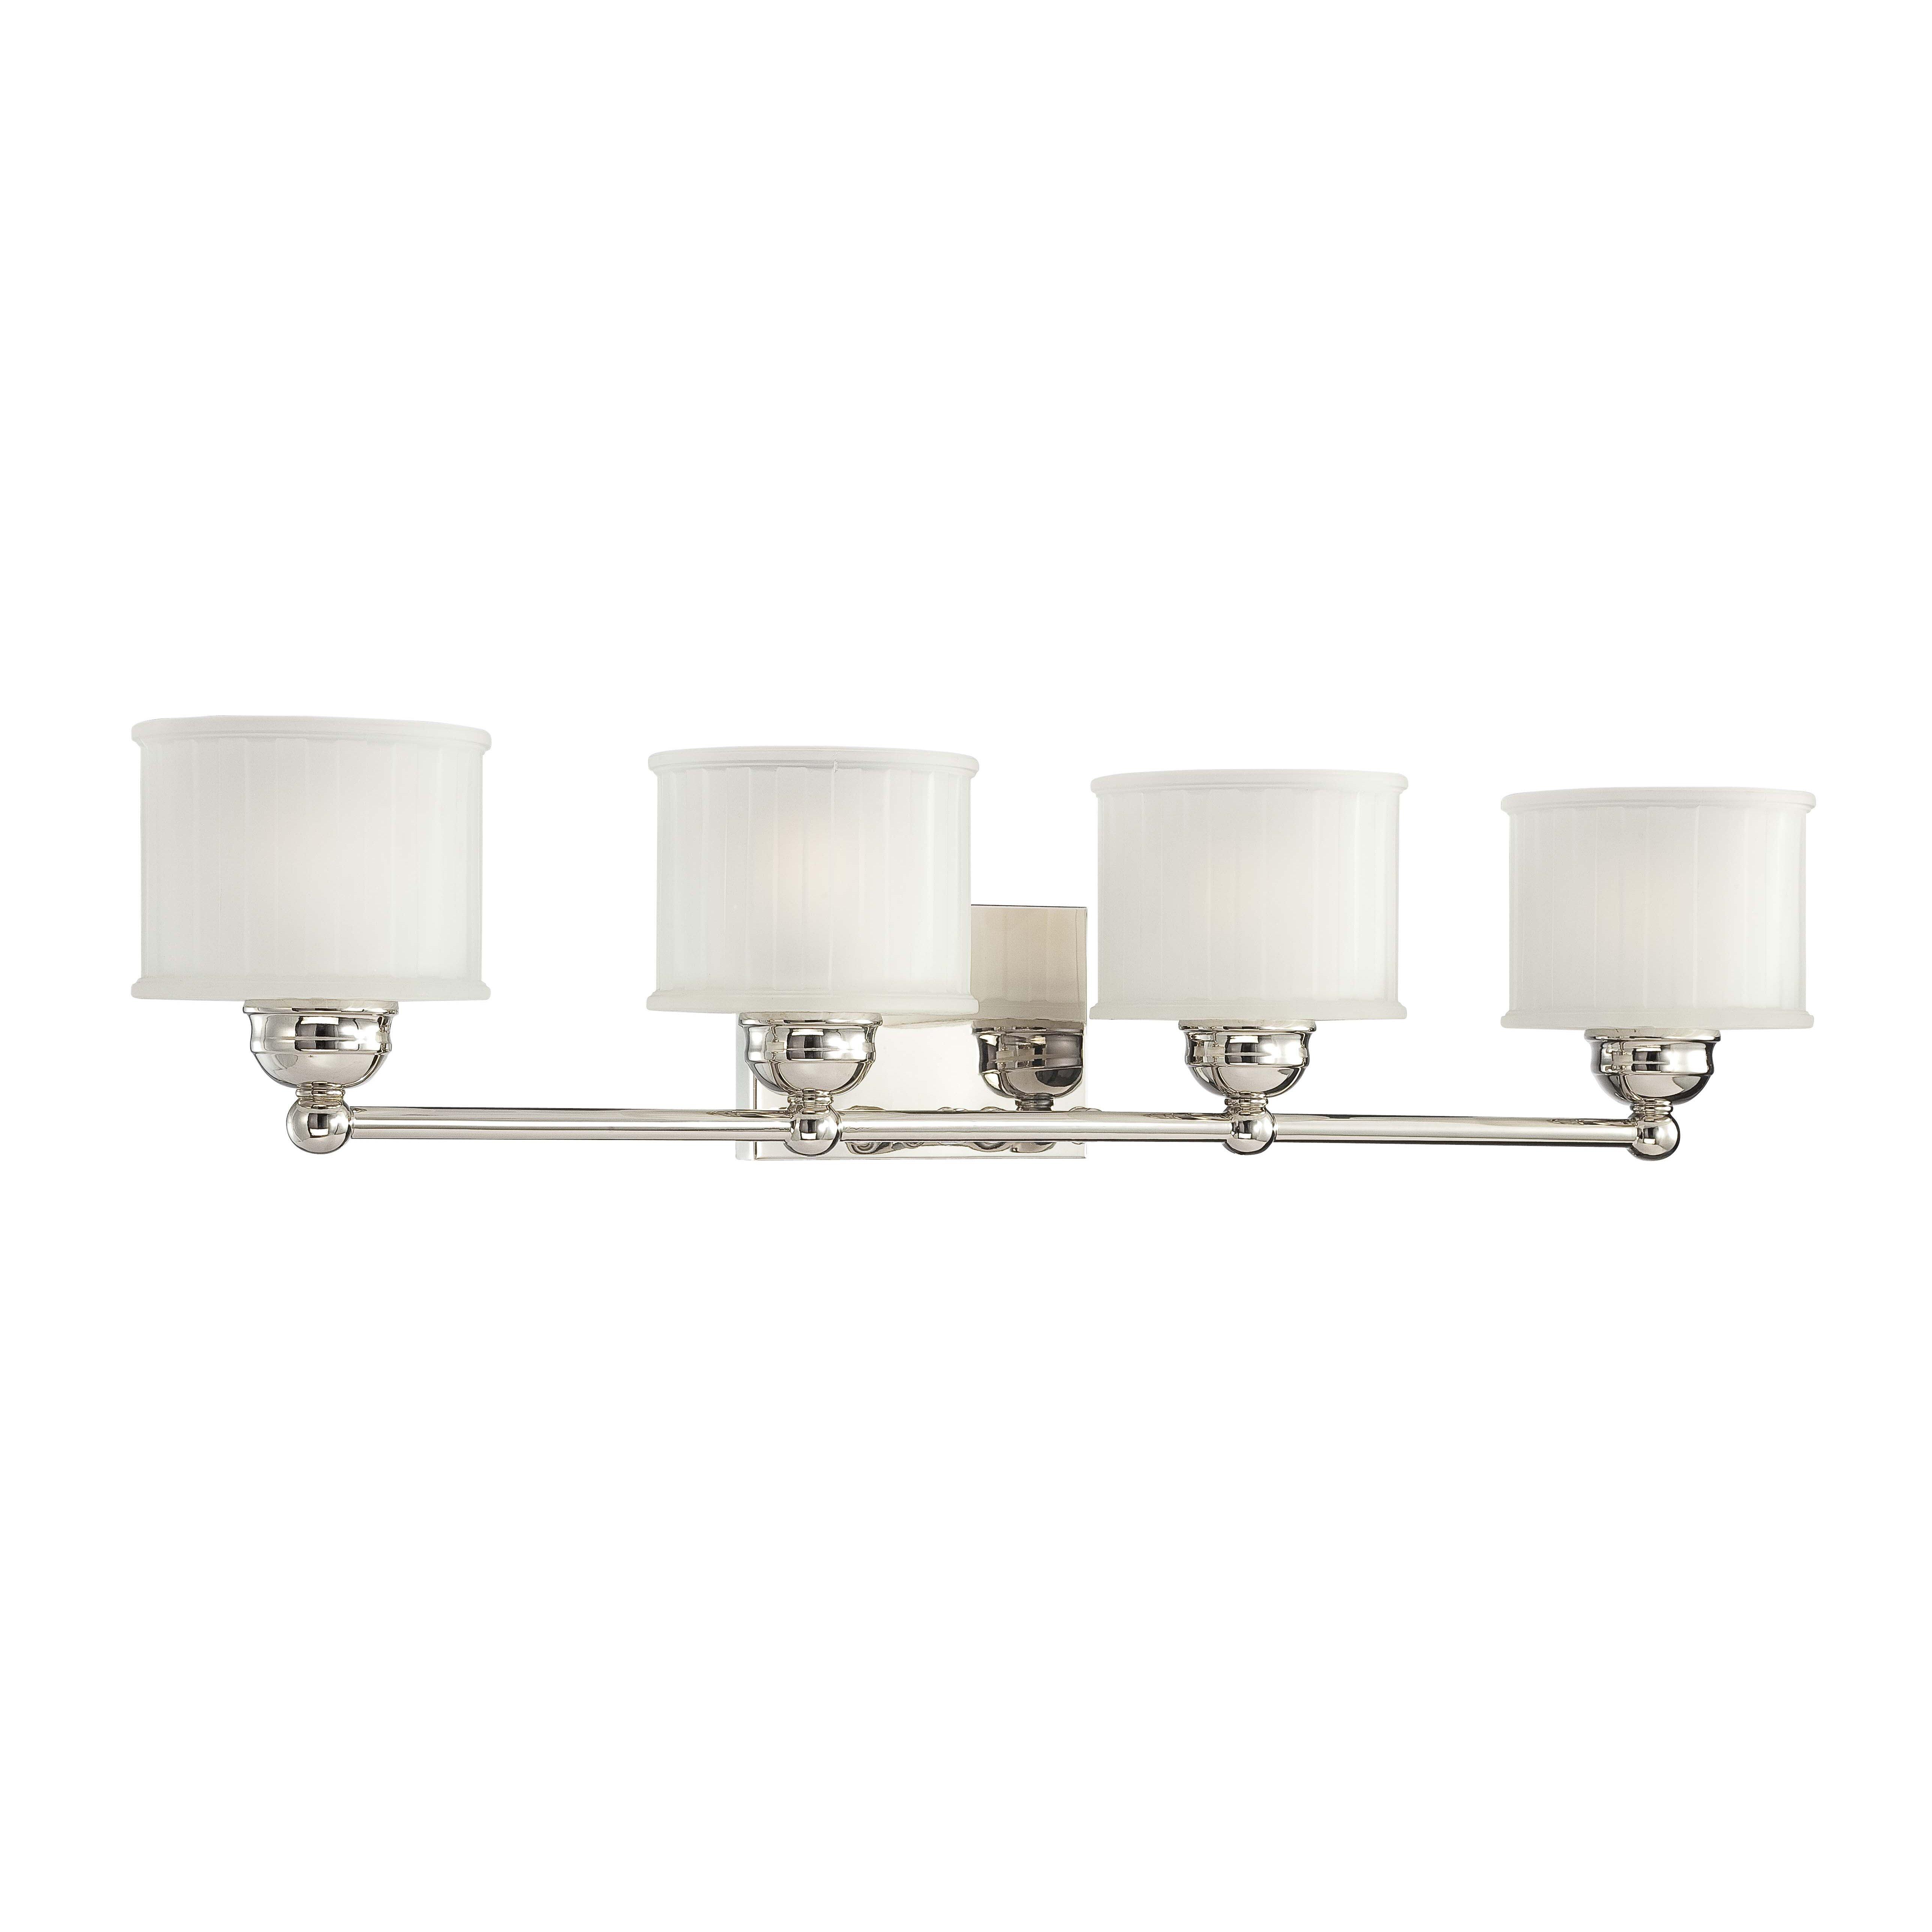 minka lavery 1730 series 4 light bath vanity light reviews wayfair. Black Bedroom Furniture Sets. Home Design Ideas